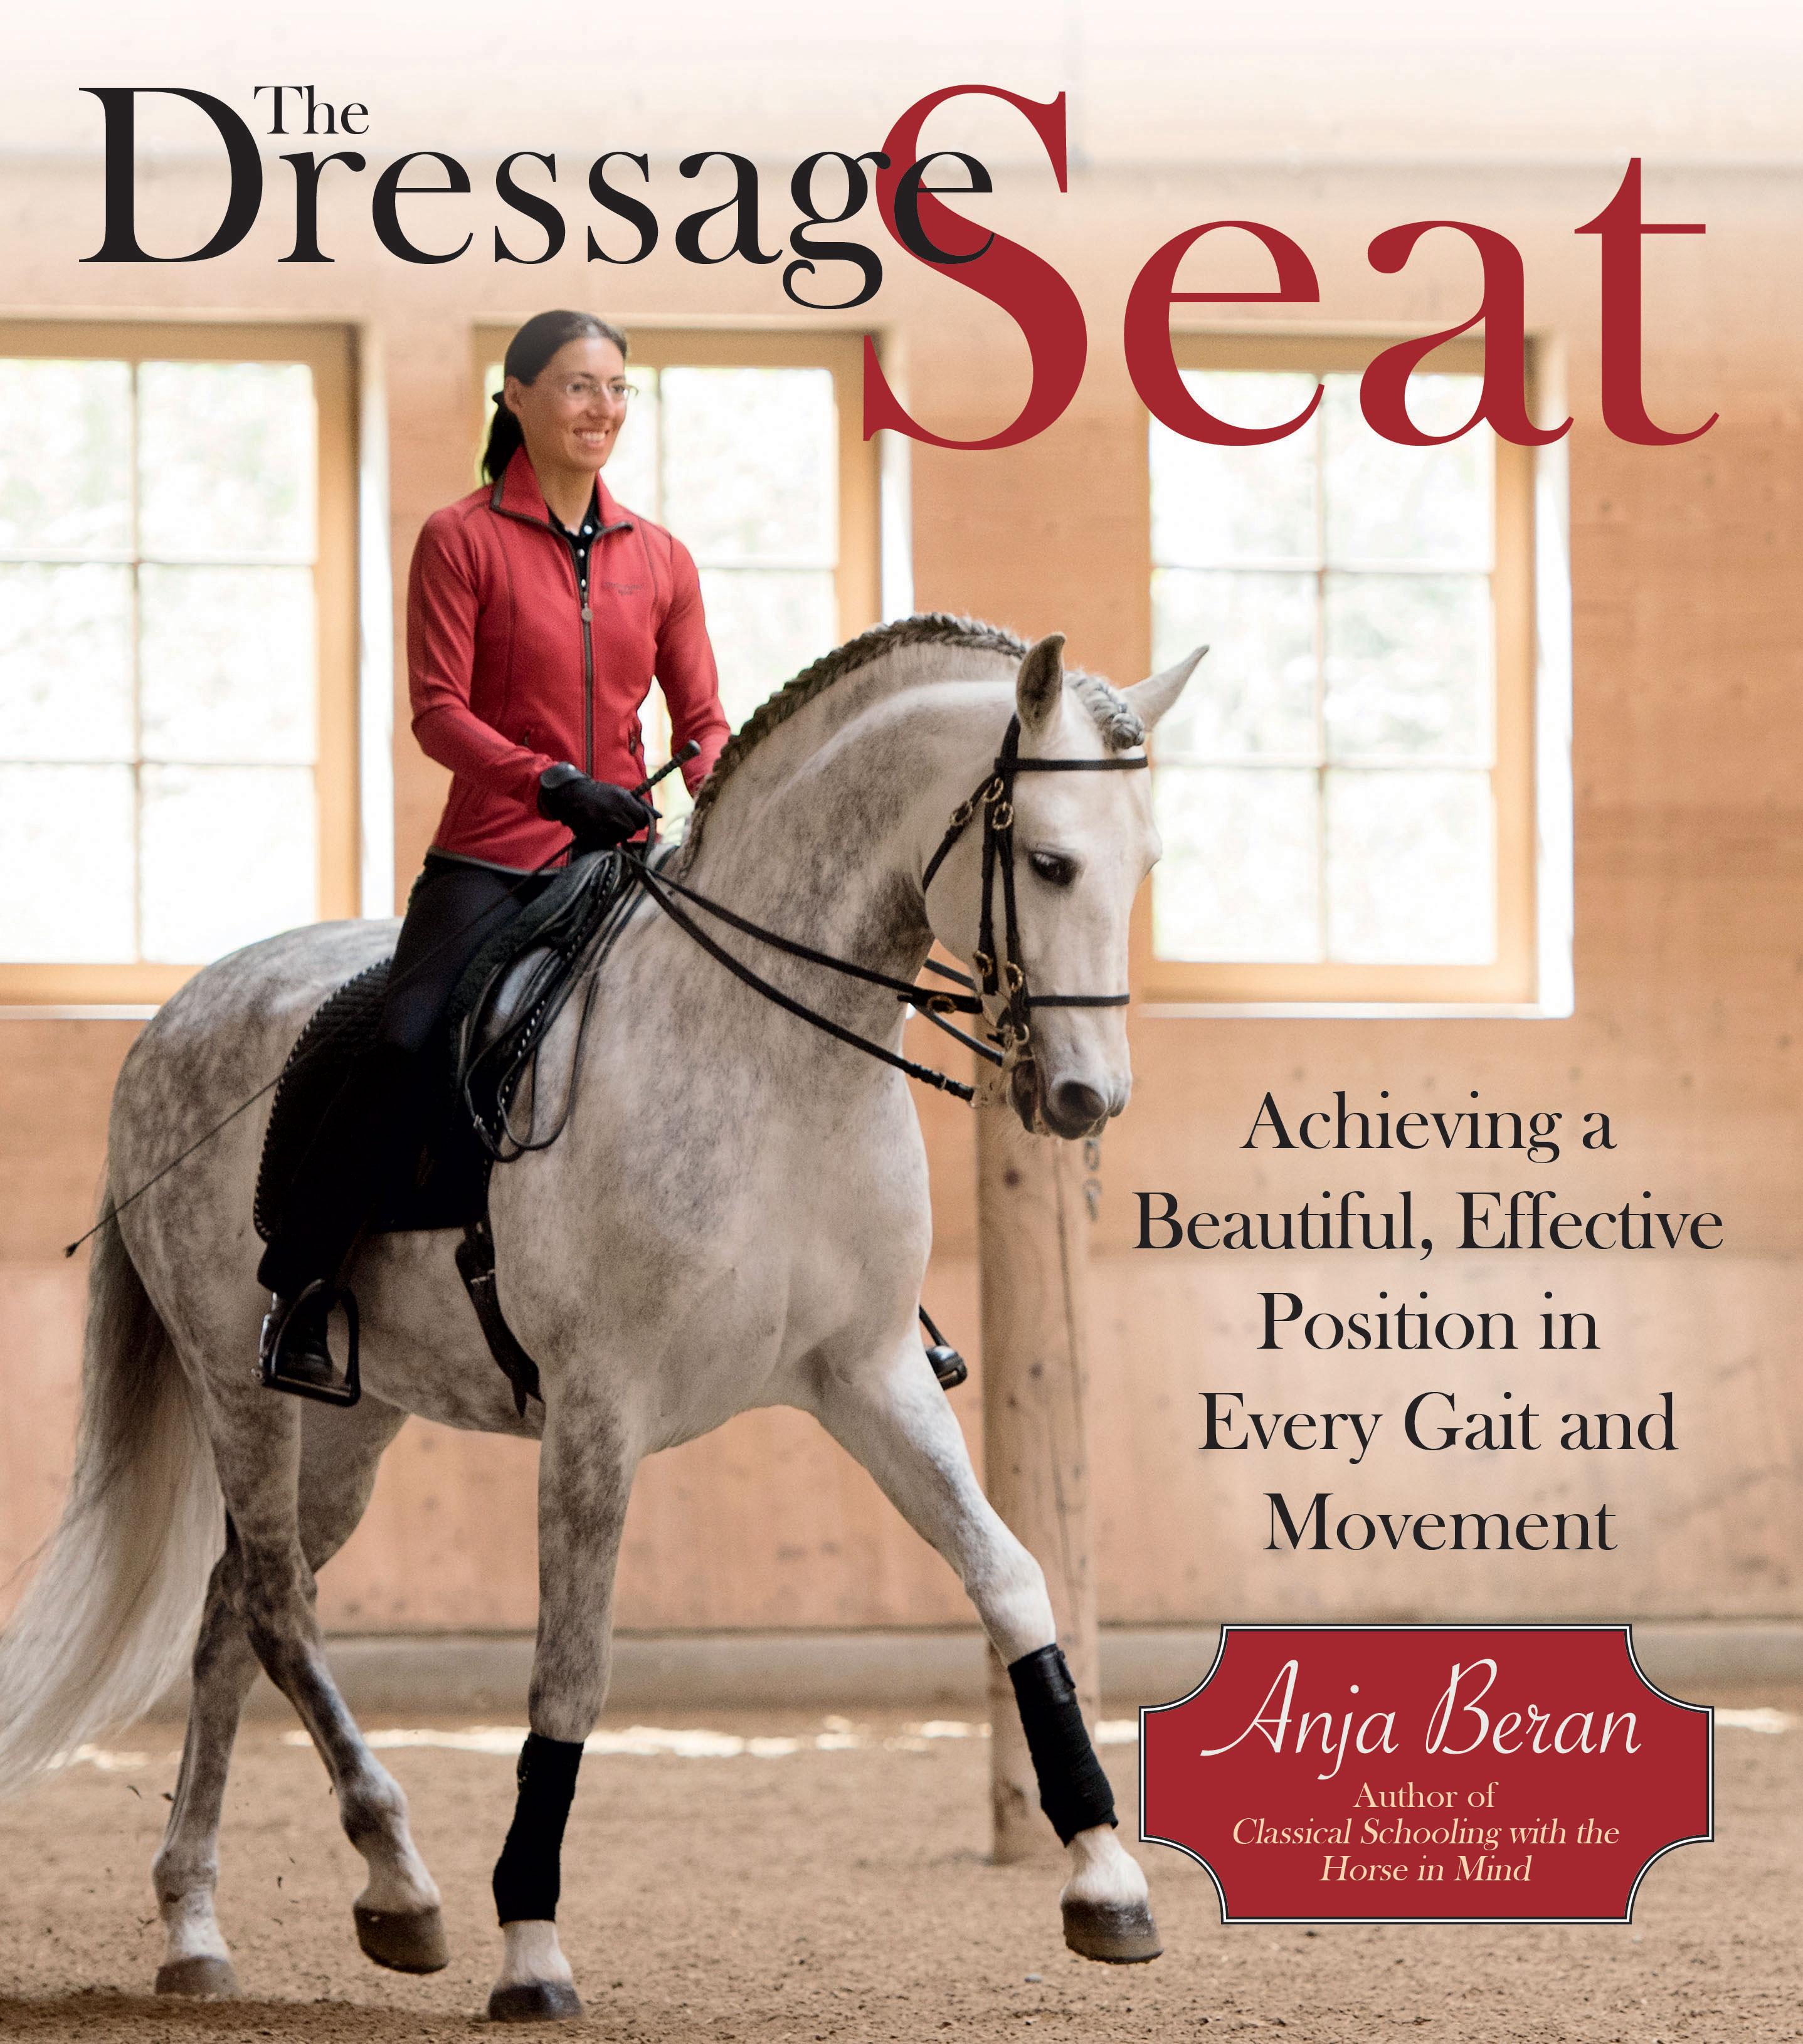 Book The Dressage Seat By Anja Beran Anja Beran